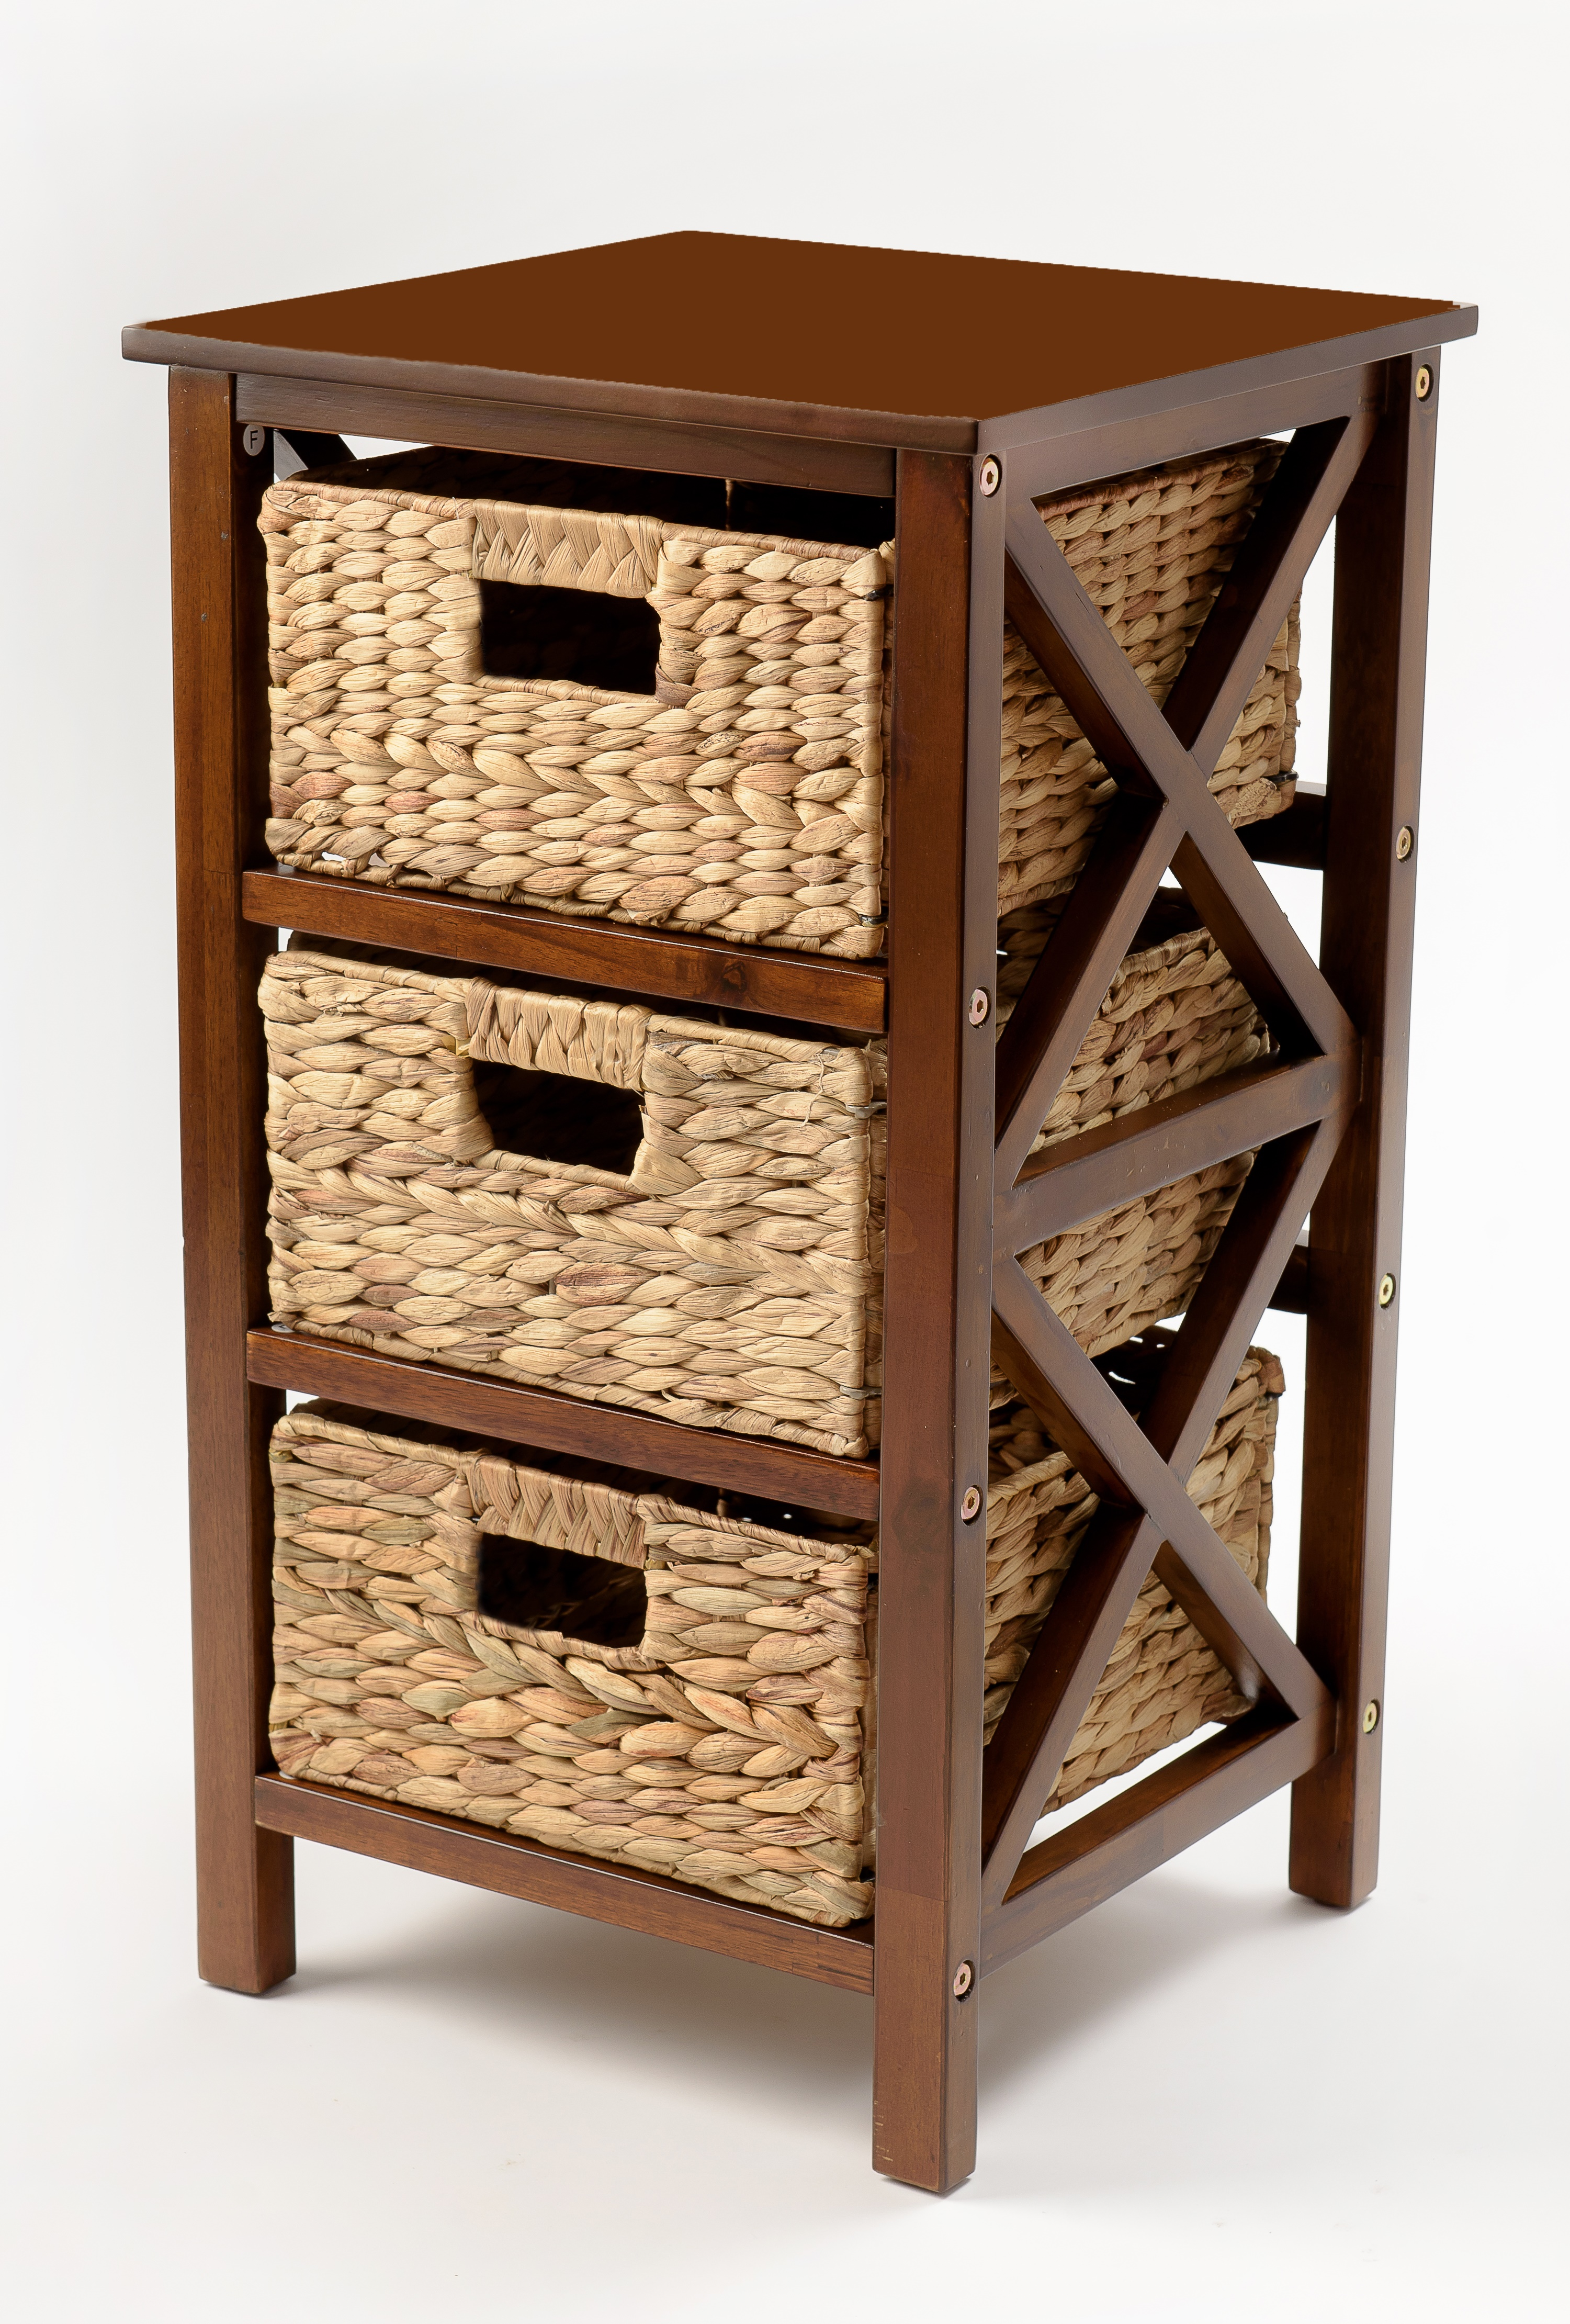 3 Tier X Side End Table Storage Cabinet With 3 Baskets In Walnut Walmart Com Walmart Com